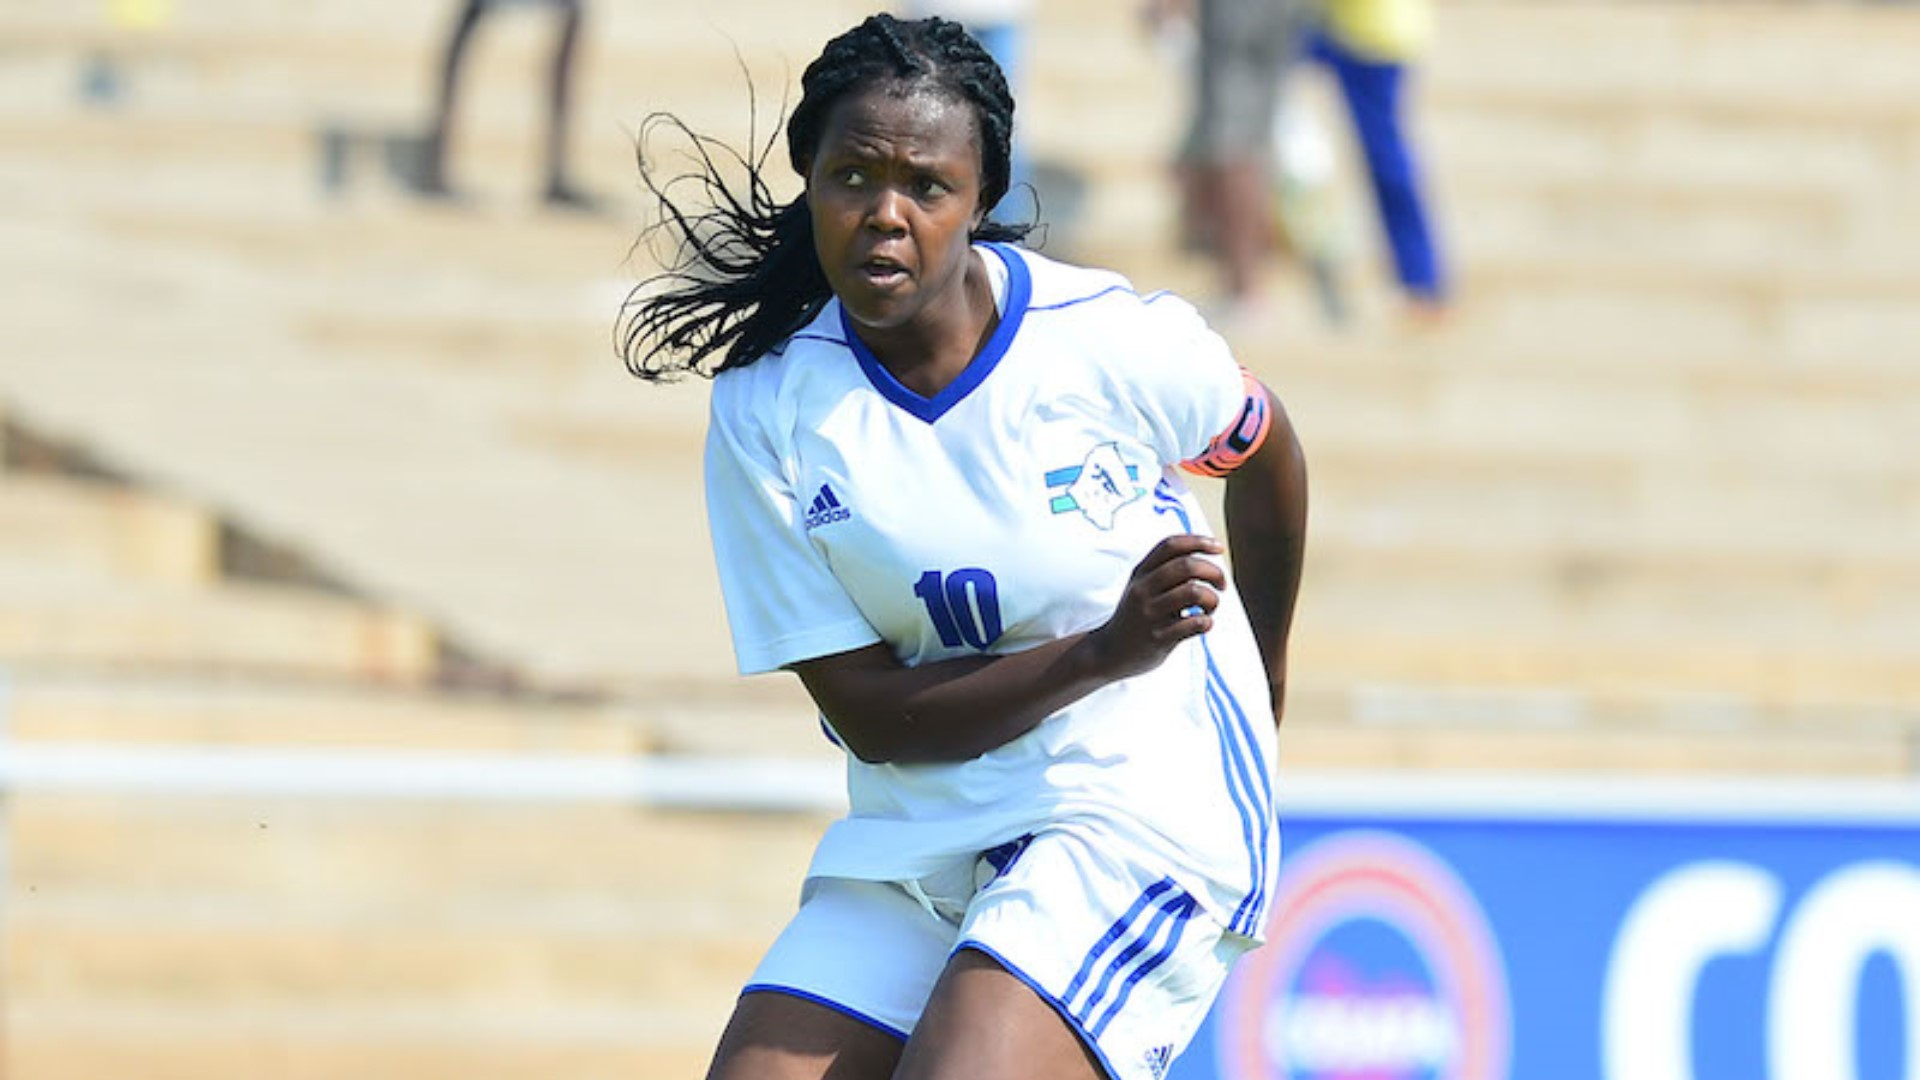 Coronavirus: Lesotho captain and US College Player of the Year Rabale tasks Basotho